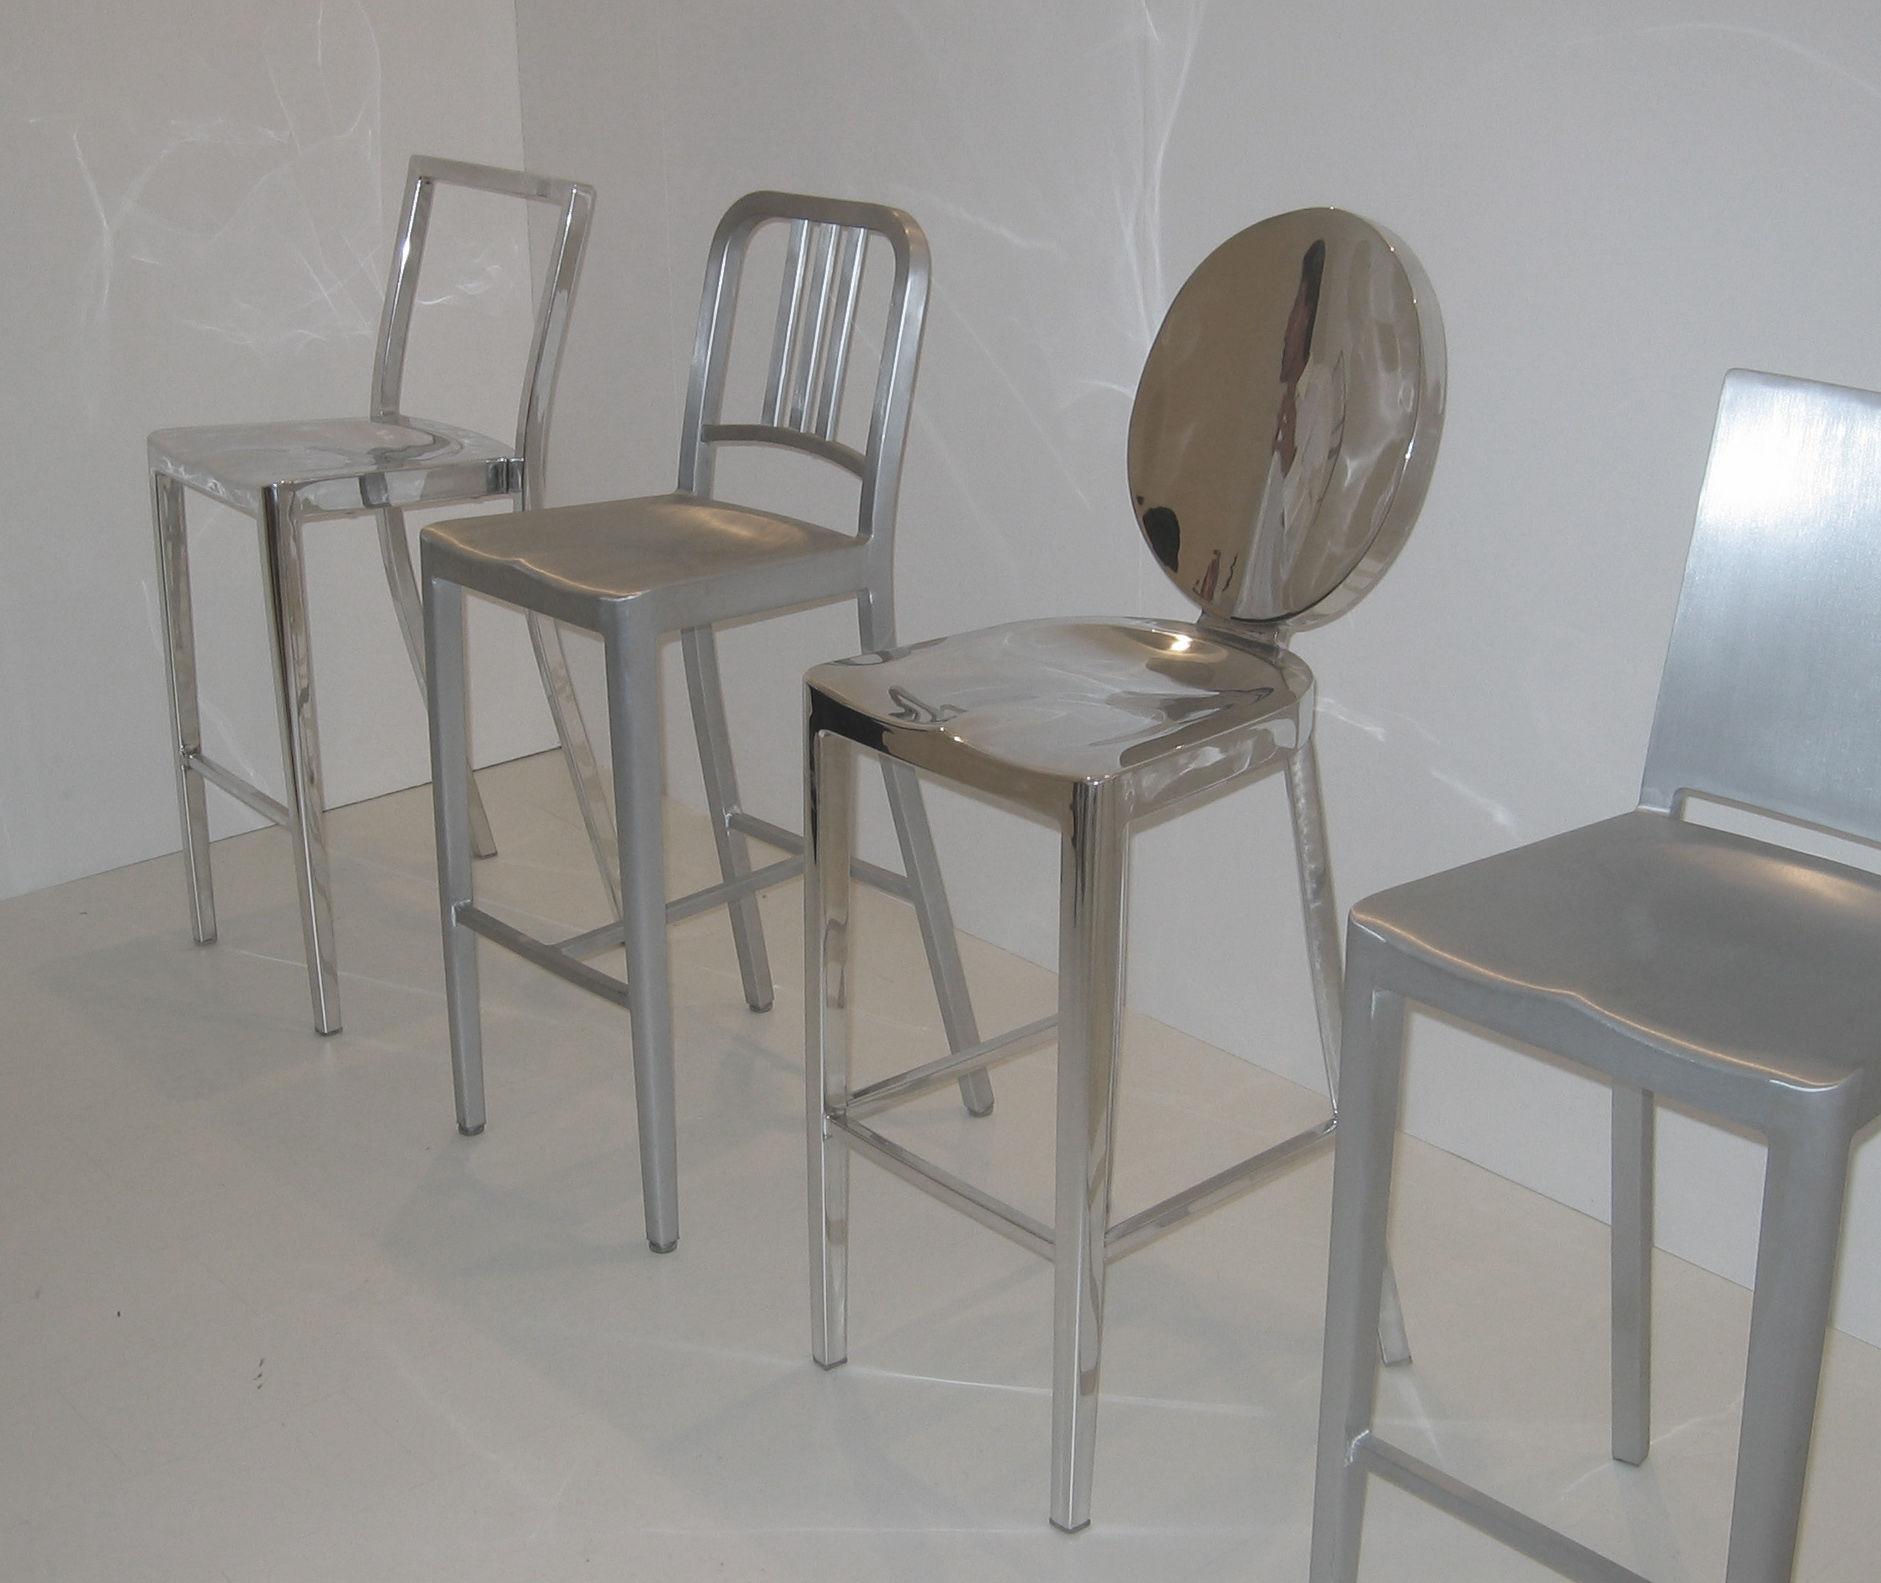 chaise de bar navy outdoor h 76 cm aluminium bross alu bross outdoor emeco made in. Black Bedroom Furniture Sets. Home Design Ideas